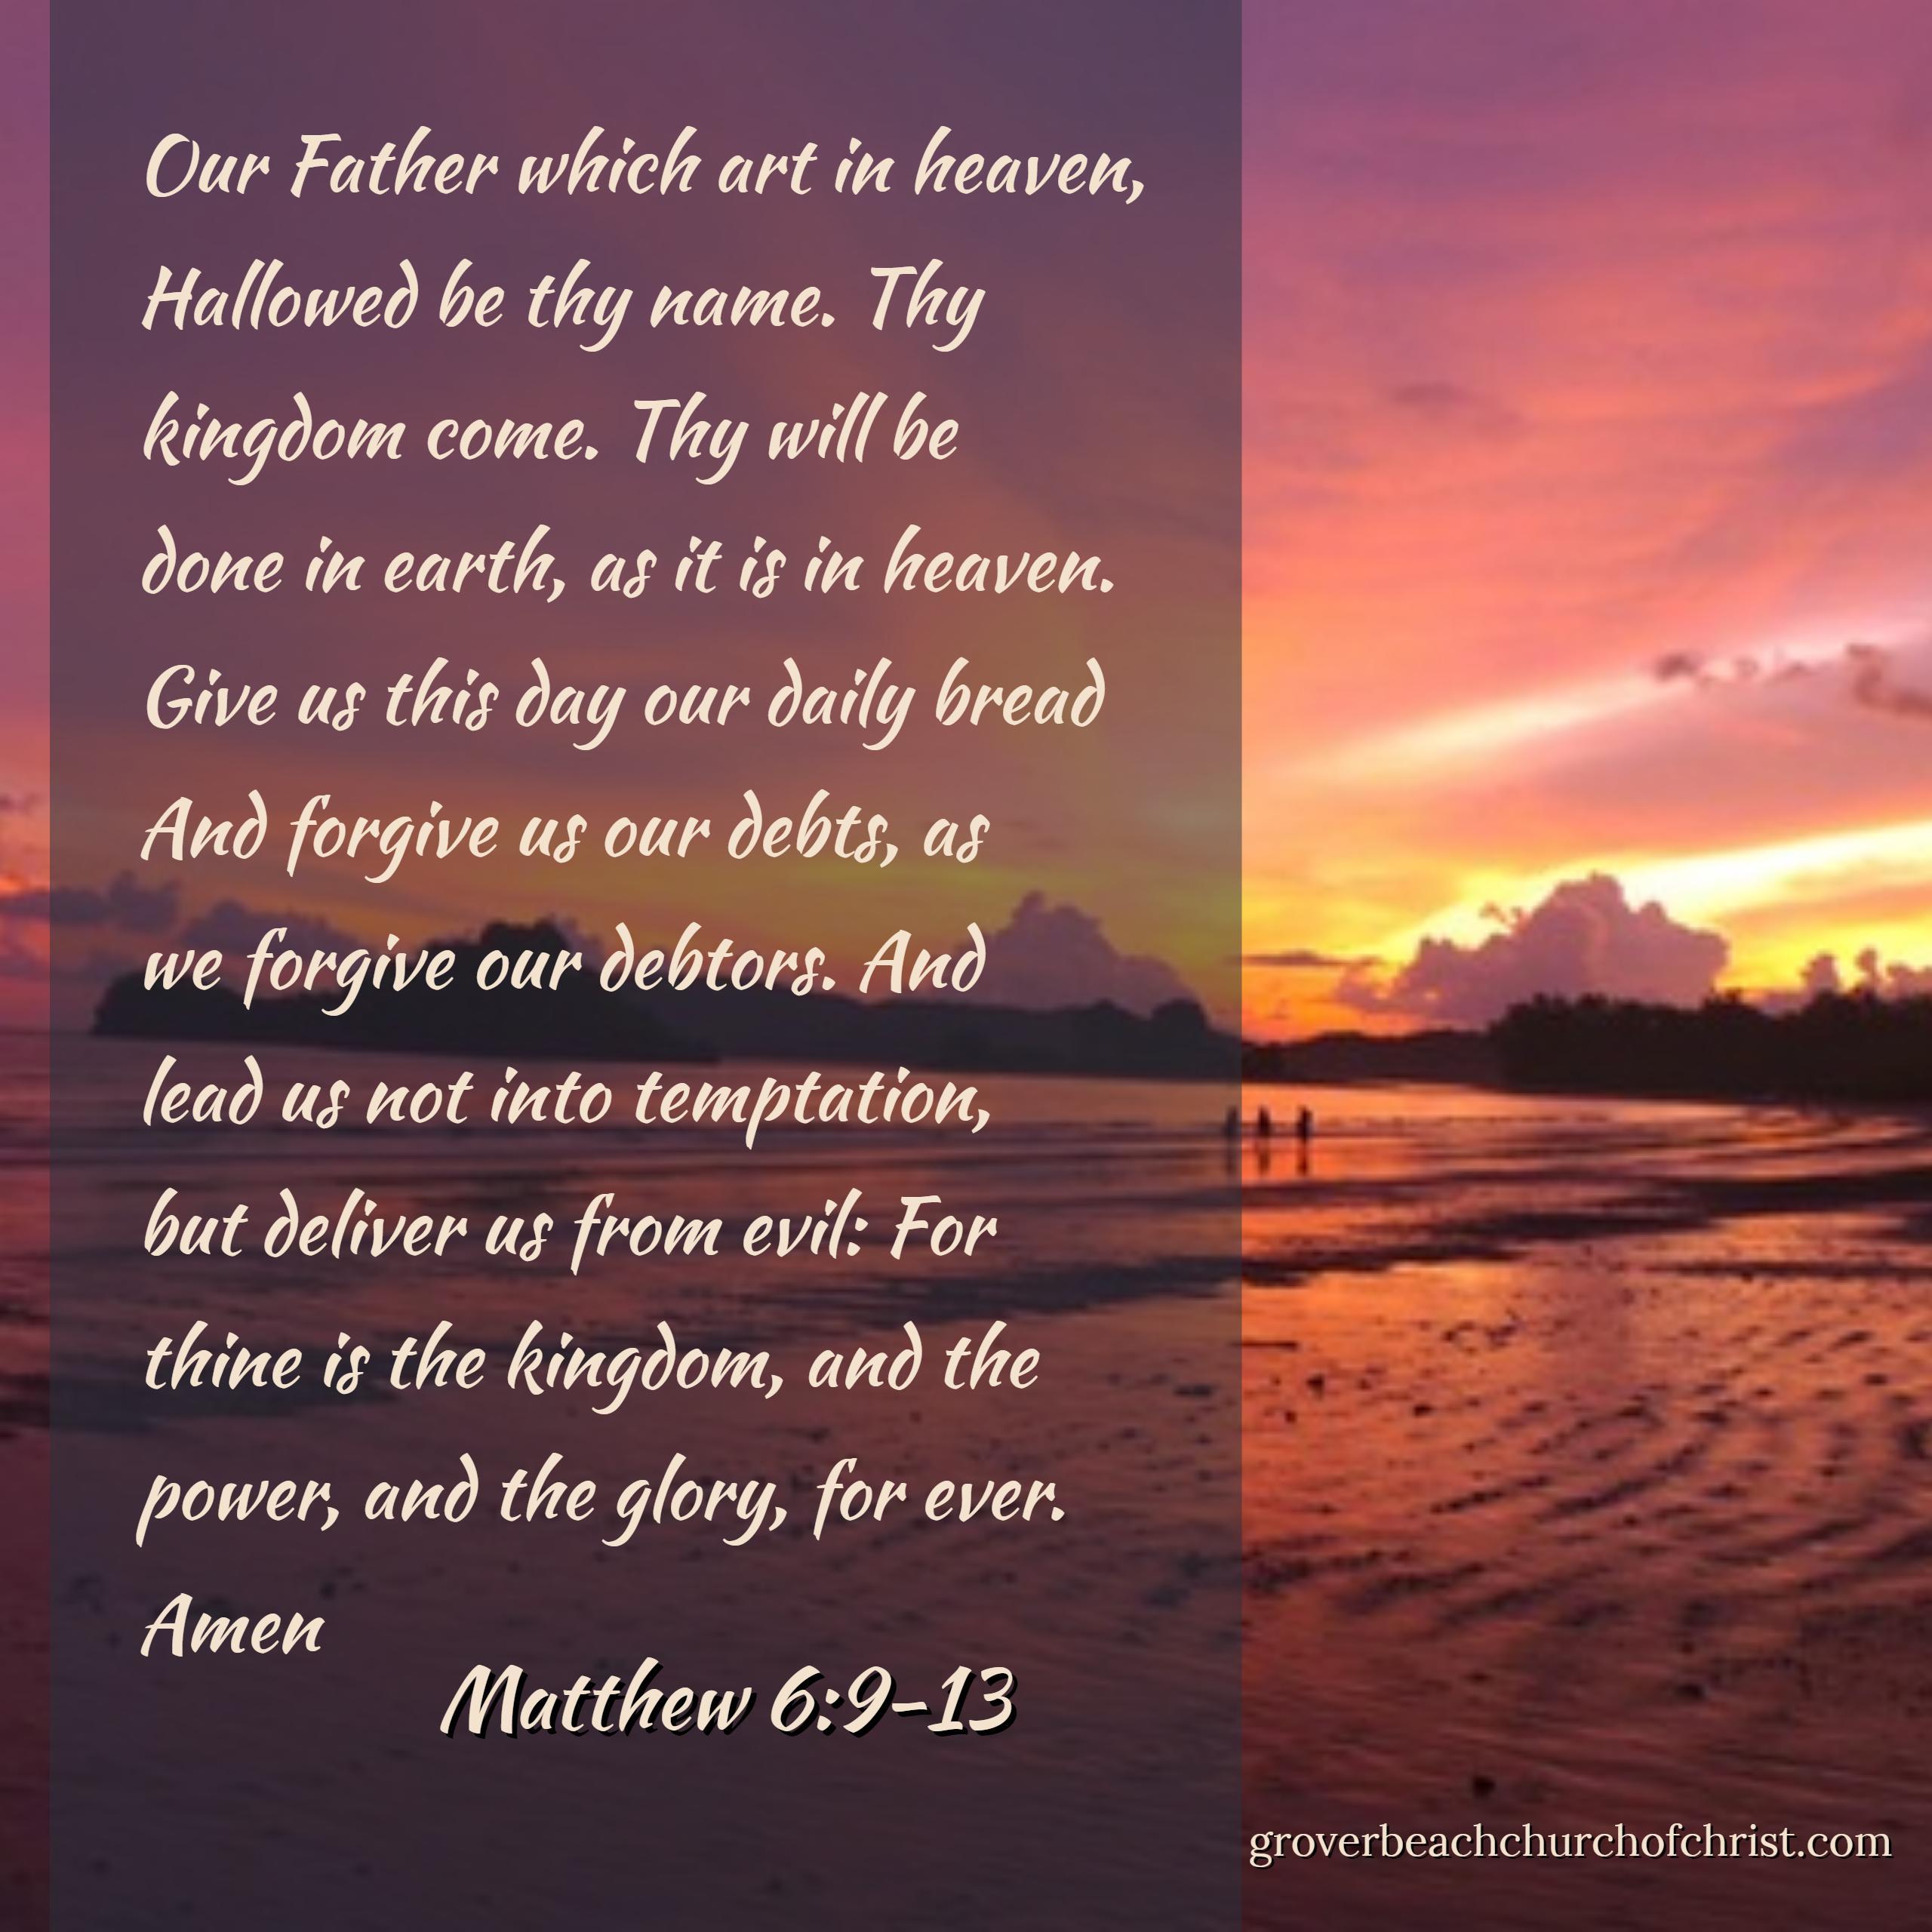 matthew-6:9-13-the-lords-prayer